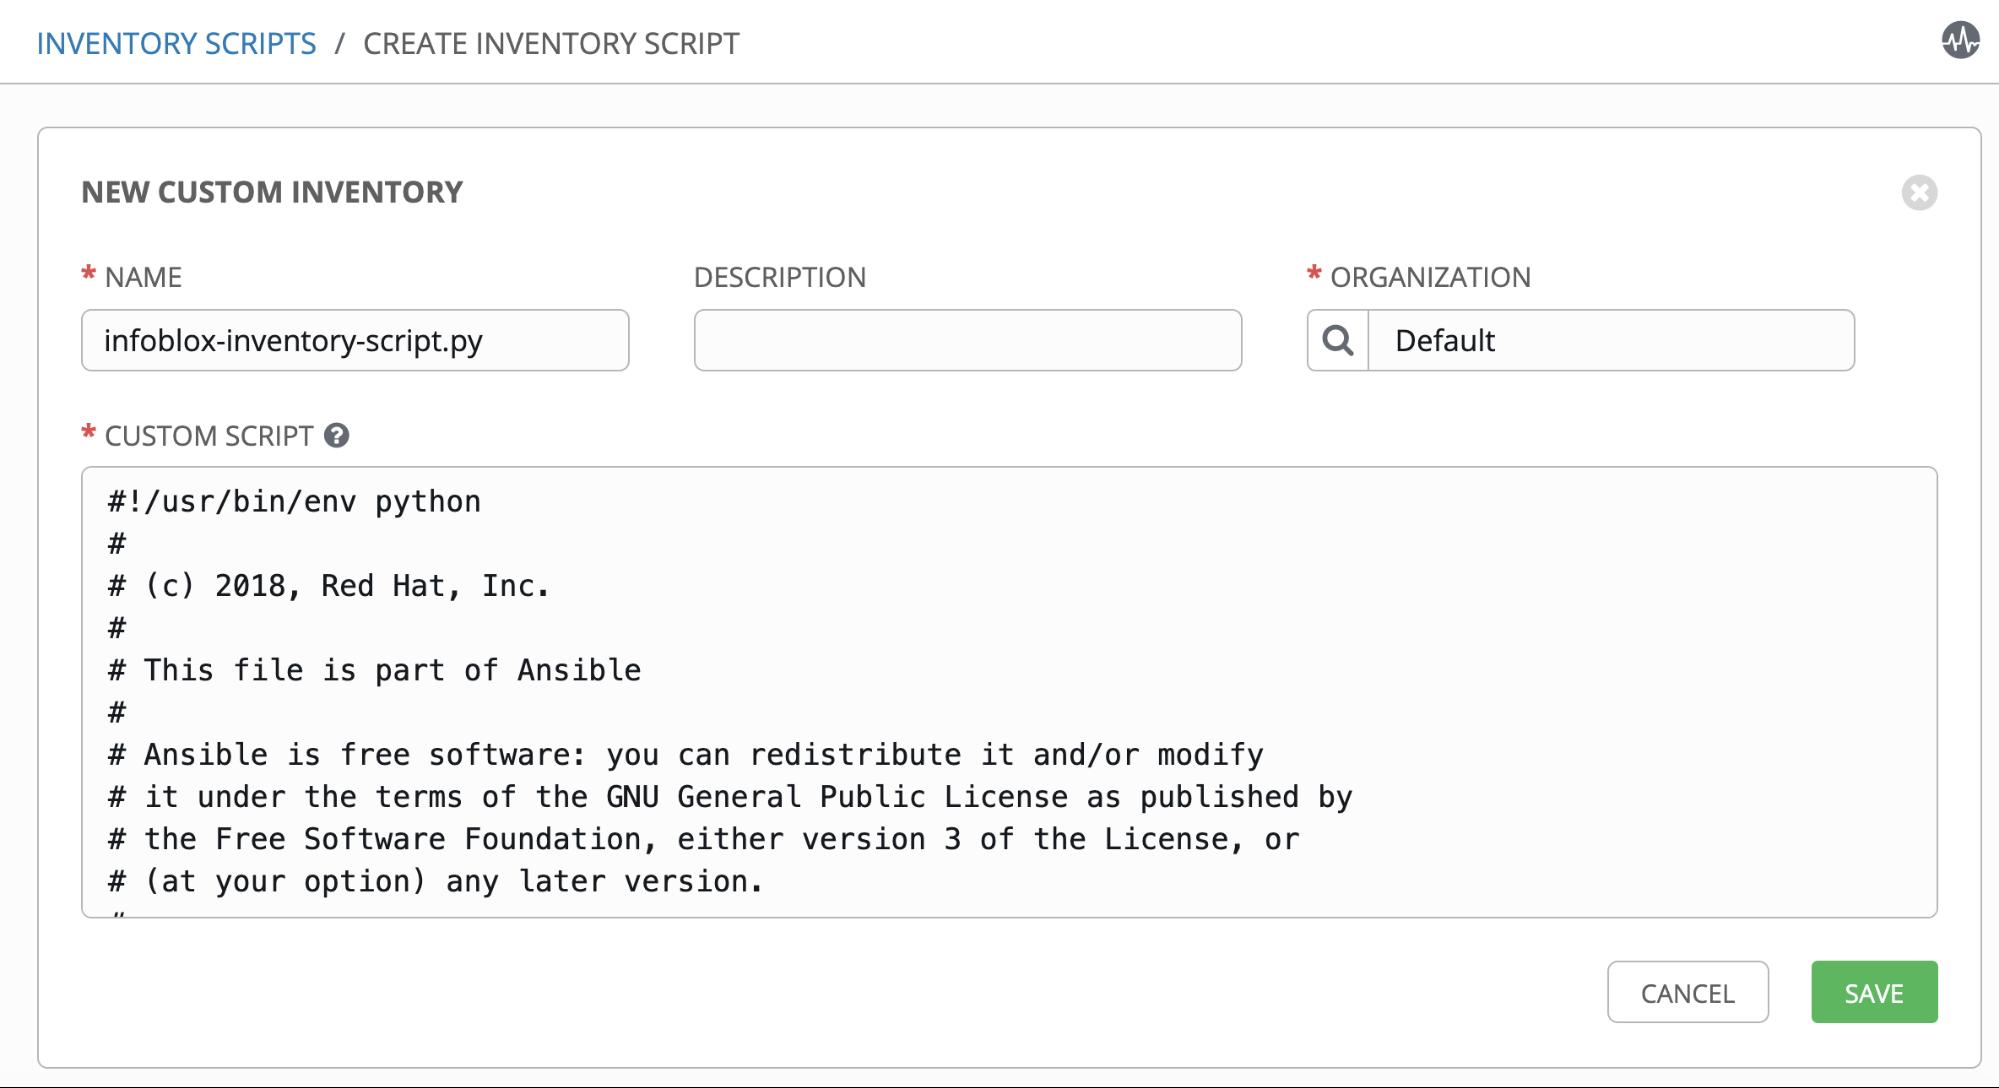 Create inventory script